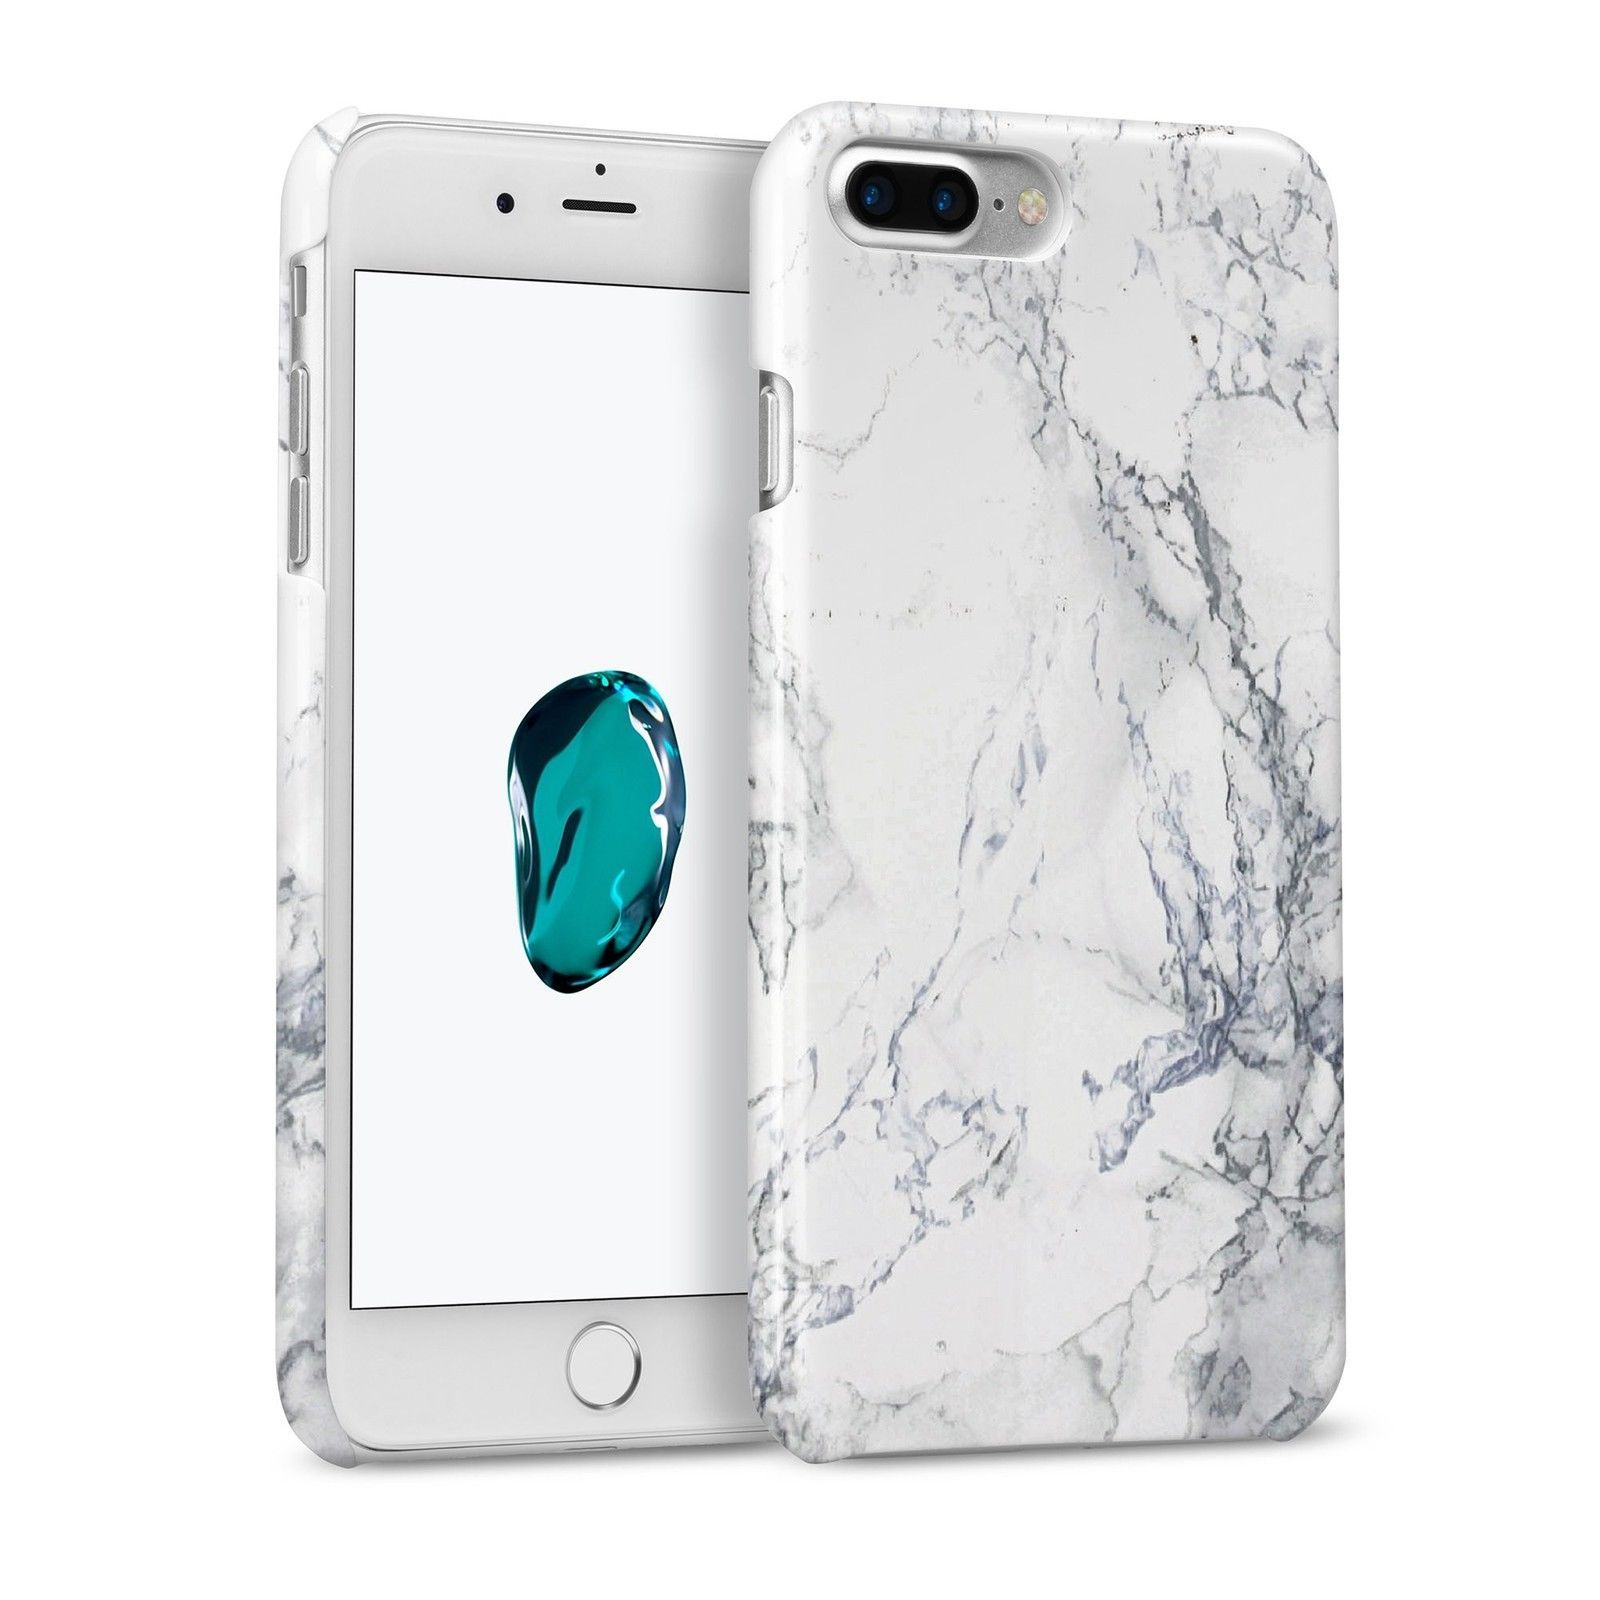 size 40 4e8cf b2d59 Xxxxxxx   Apple iPhone 7 Plus   Iphone, Iphone 7 plus, Iphone 7 plus ...